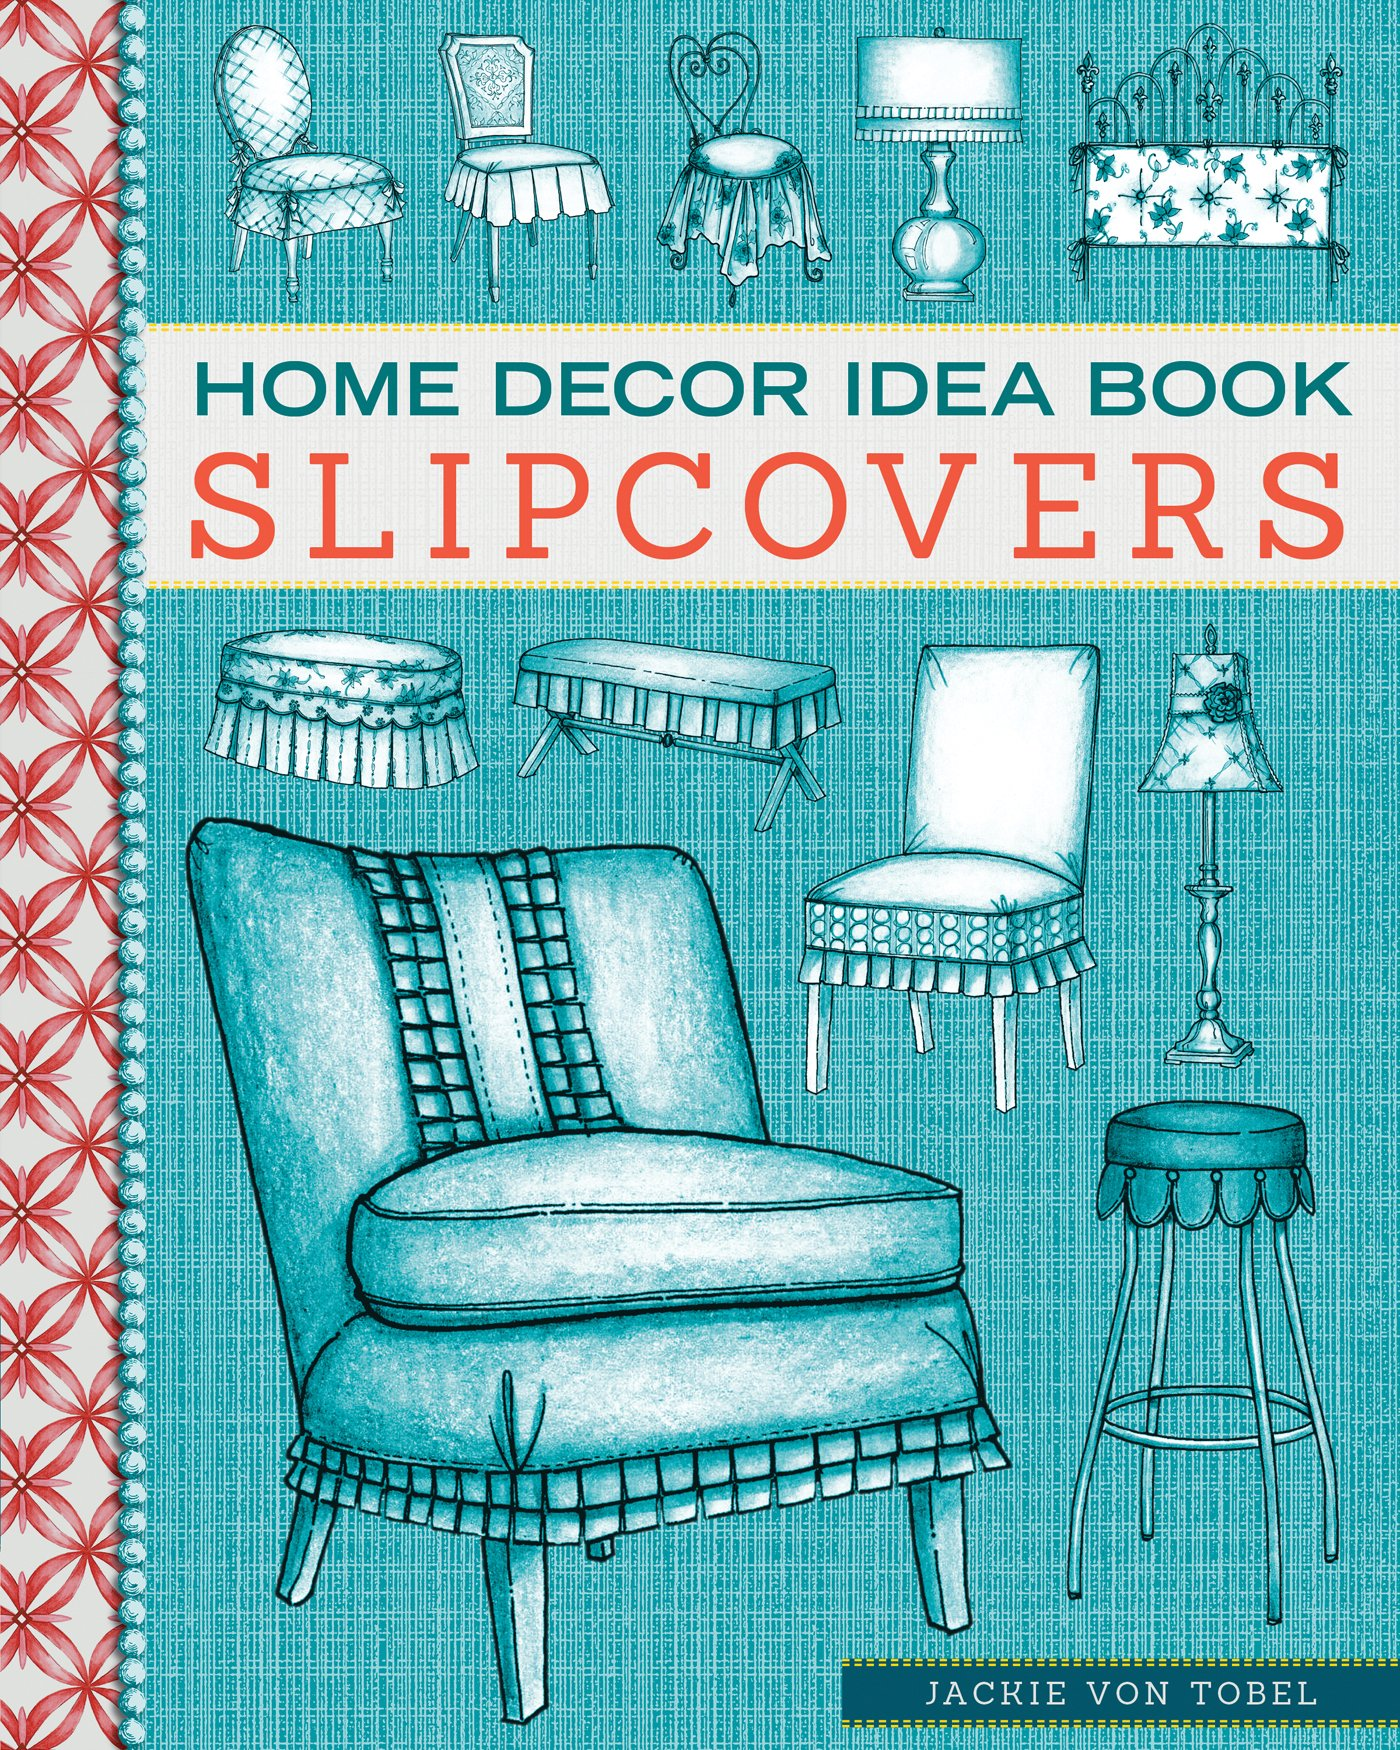 Home Decor Idea Book Upholstery